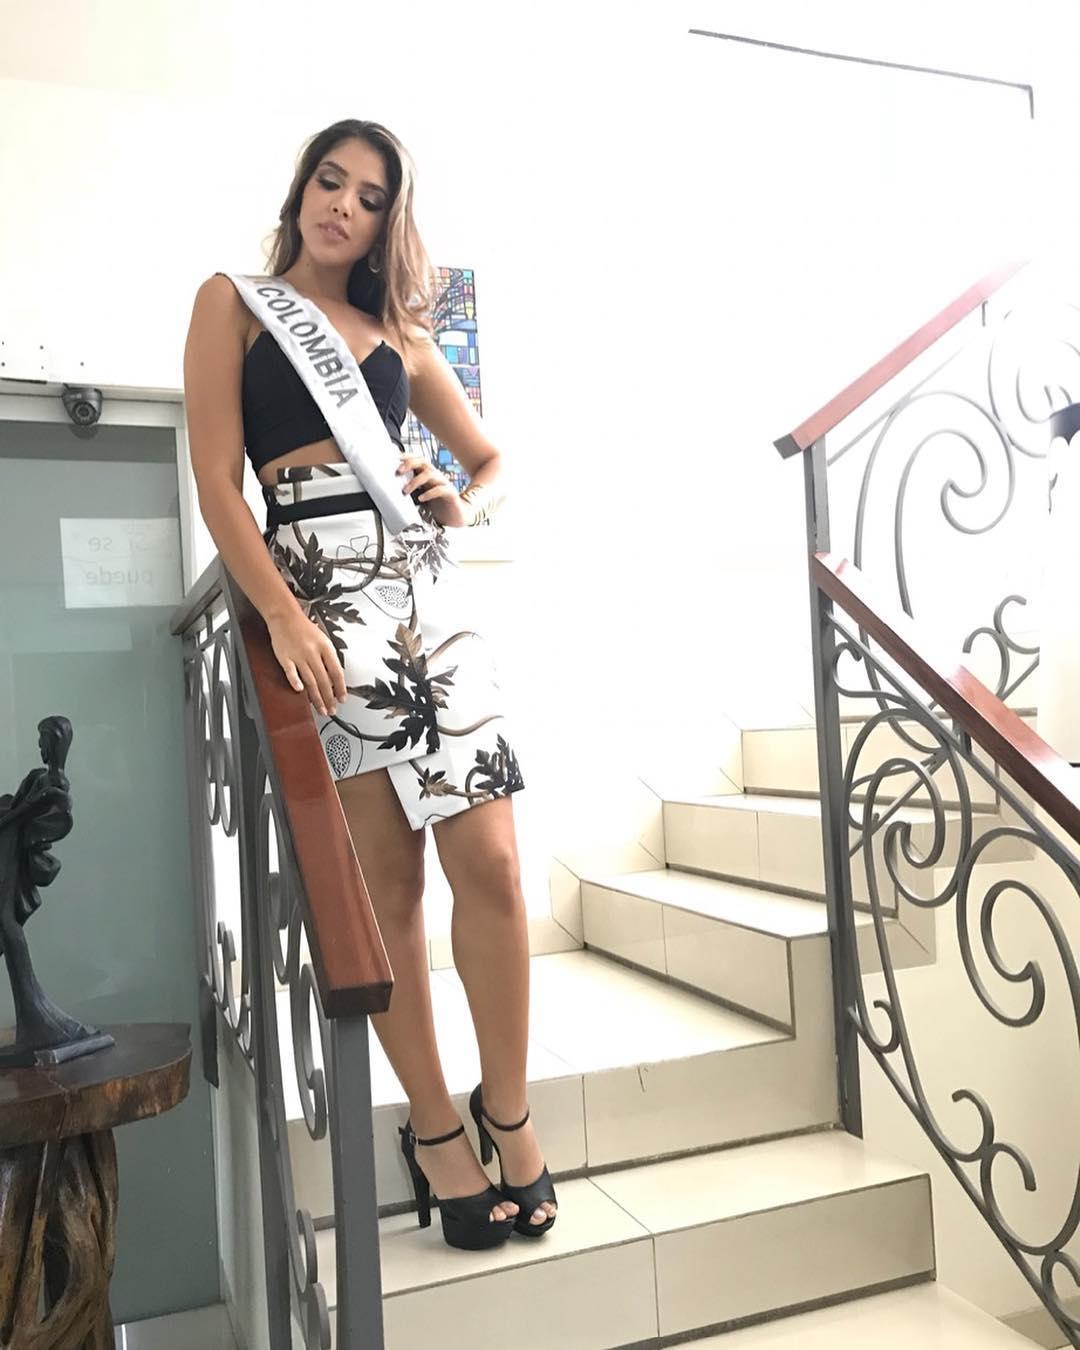 zeguer iguaran issa, miss colombia hispanoamericana 2017. - Página 2 22710146_312761149211803_2134417653110931456_n